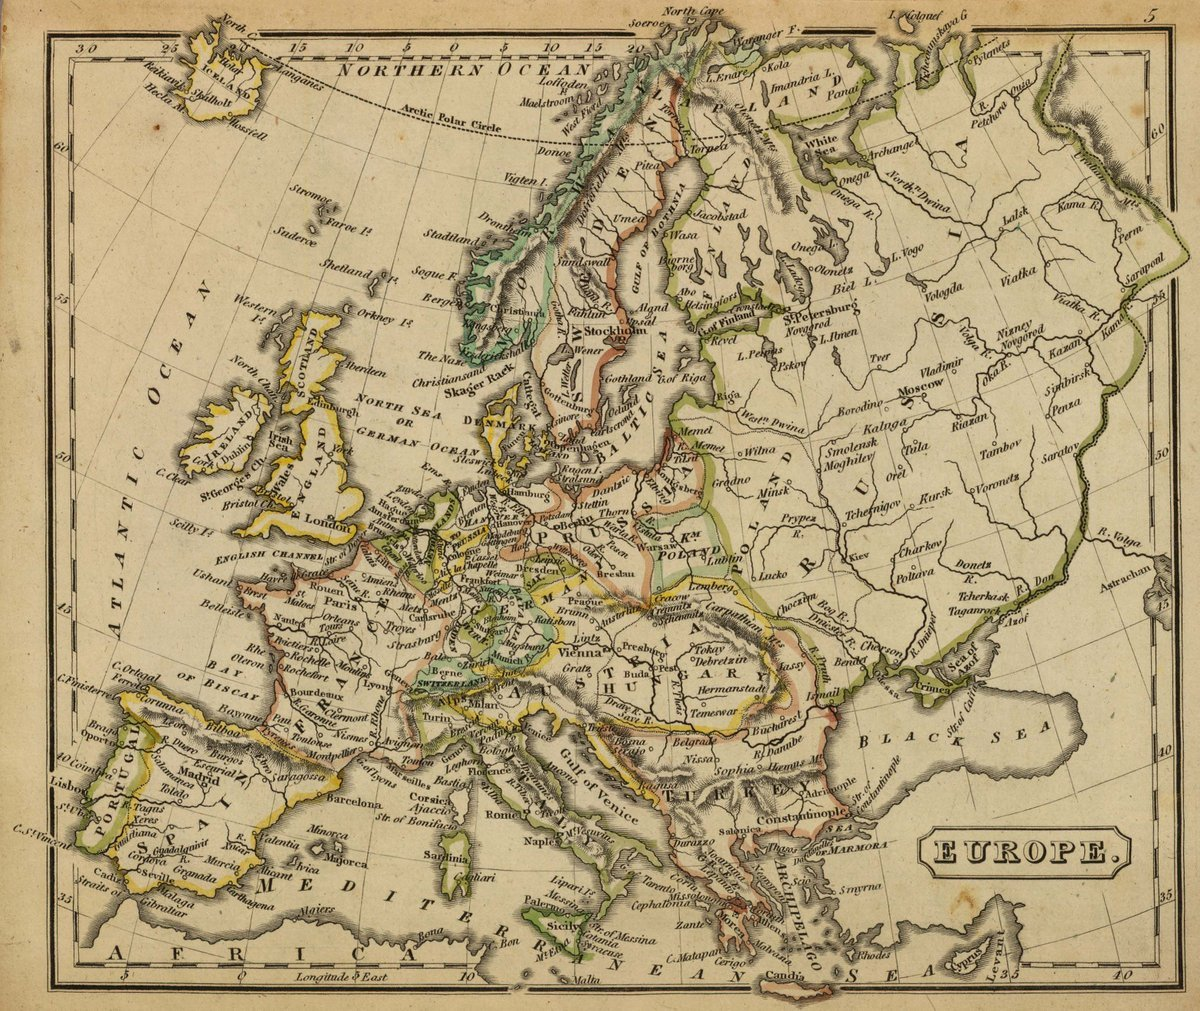 1826 School Atlas   Europe. (Boston: Hilliard, Gray, Little and Wilkins, 1826)   Antique Vintage Map Reprint